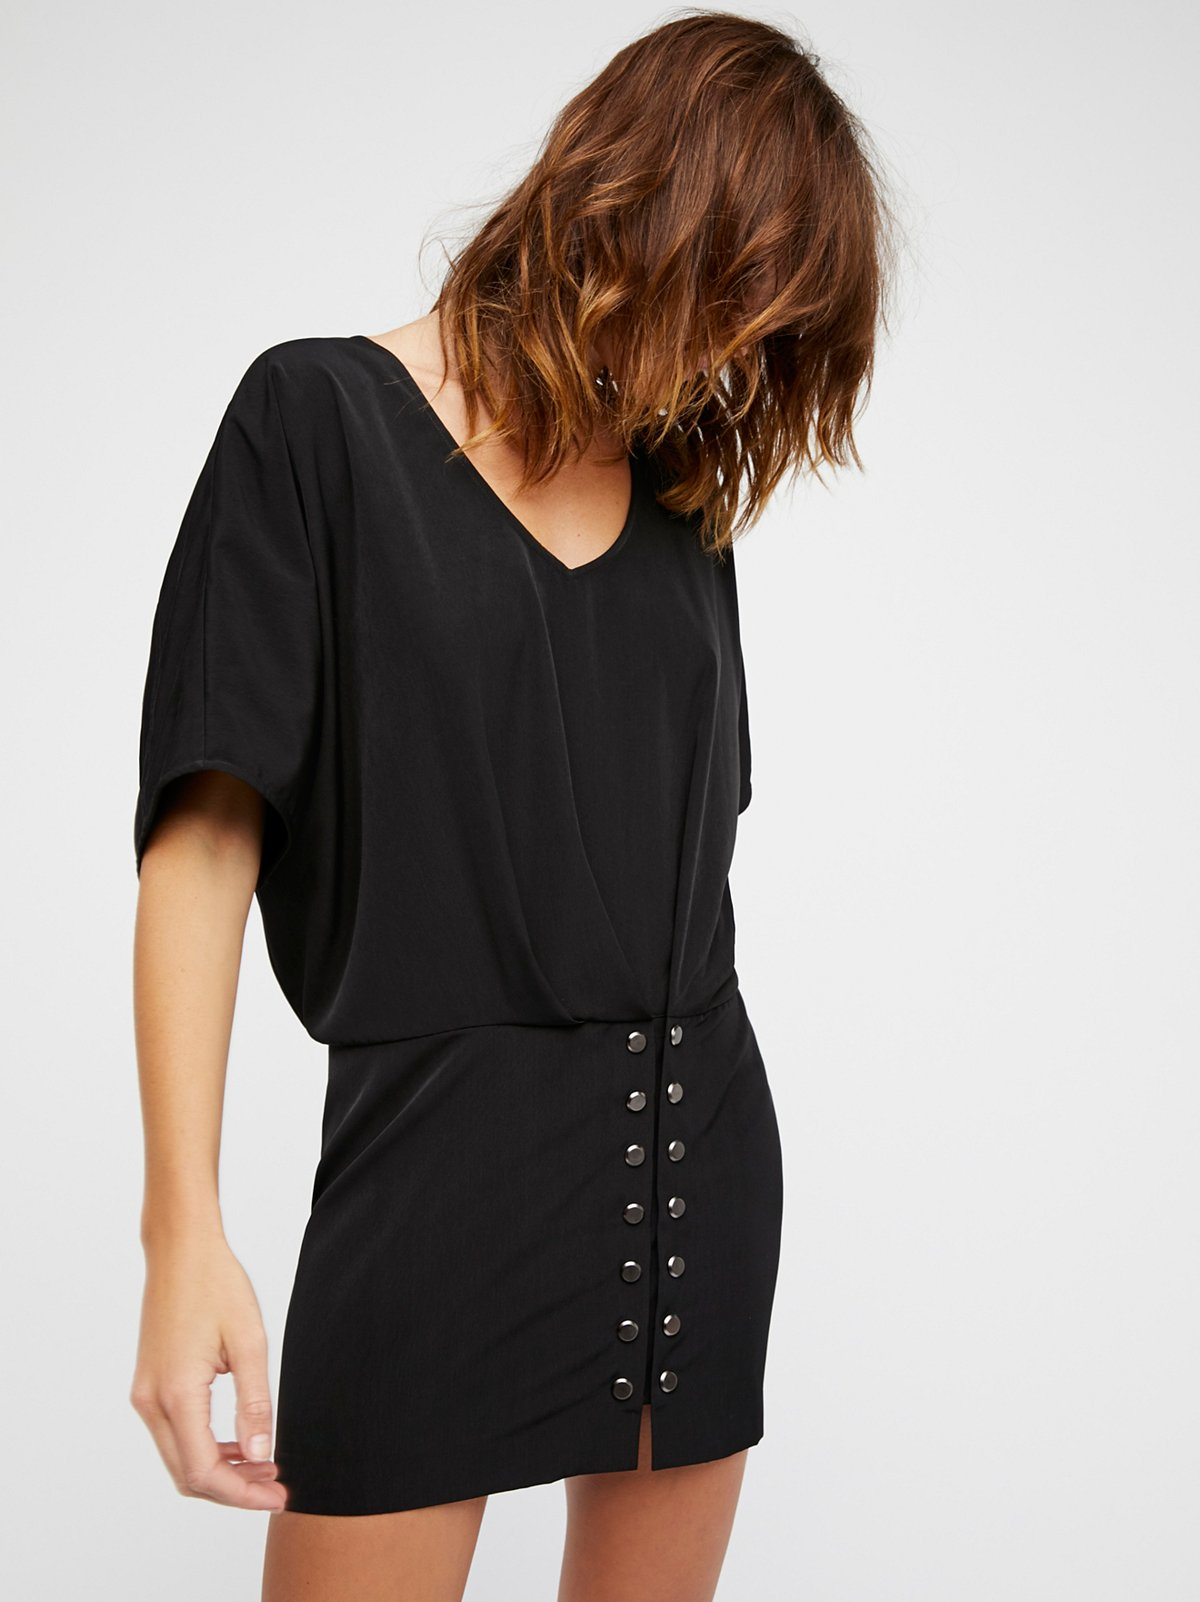 gauge black evening dress